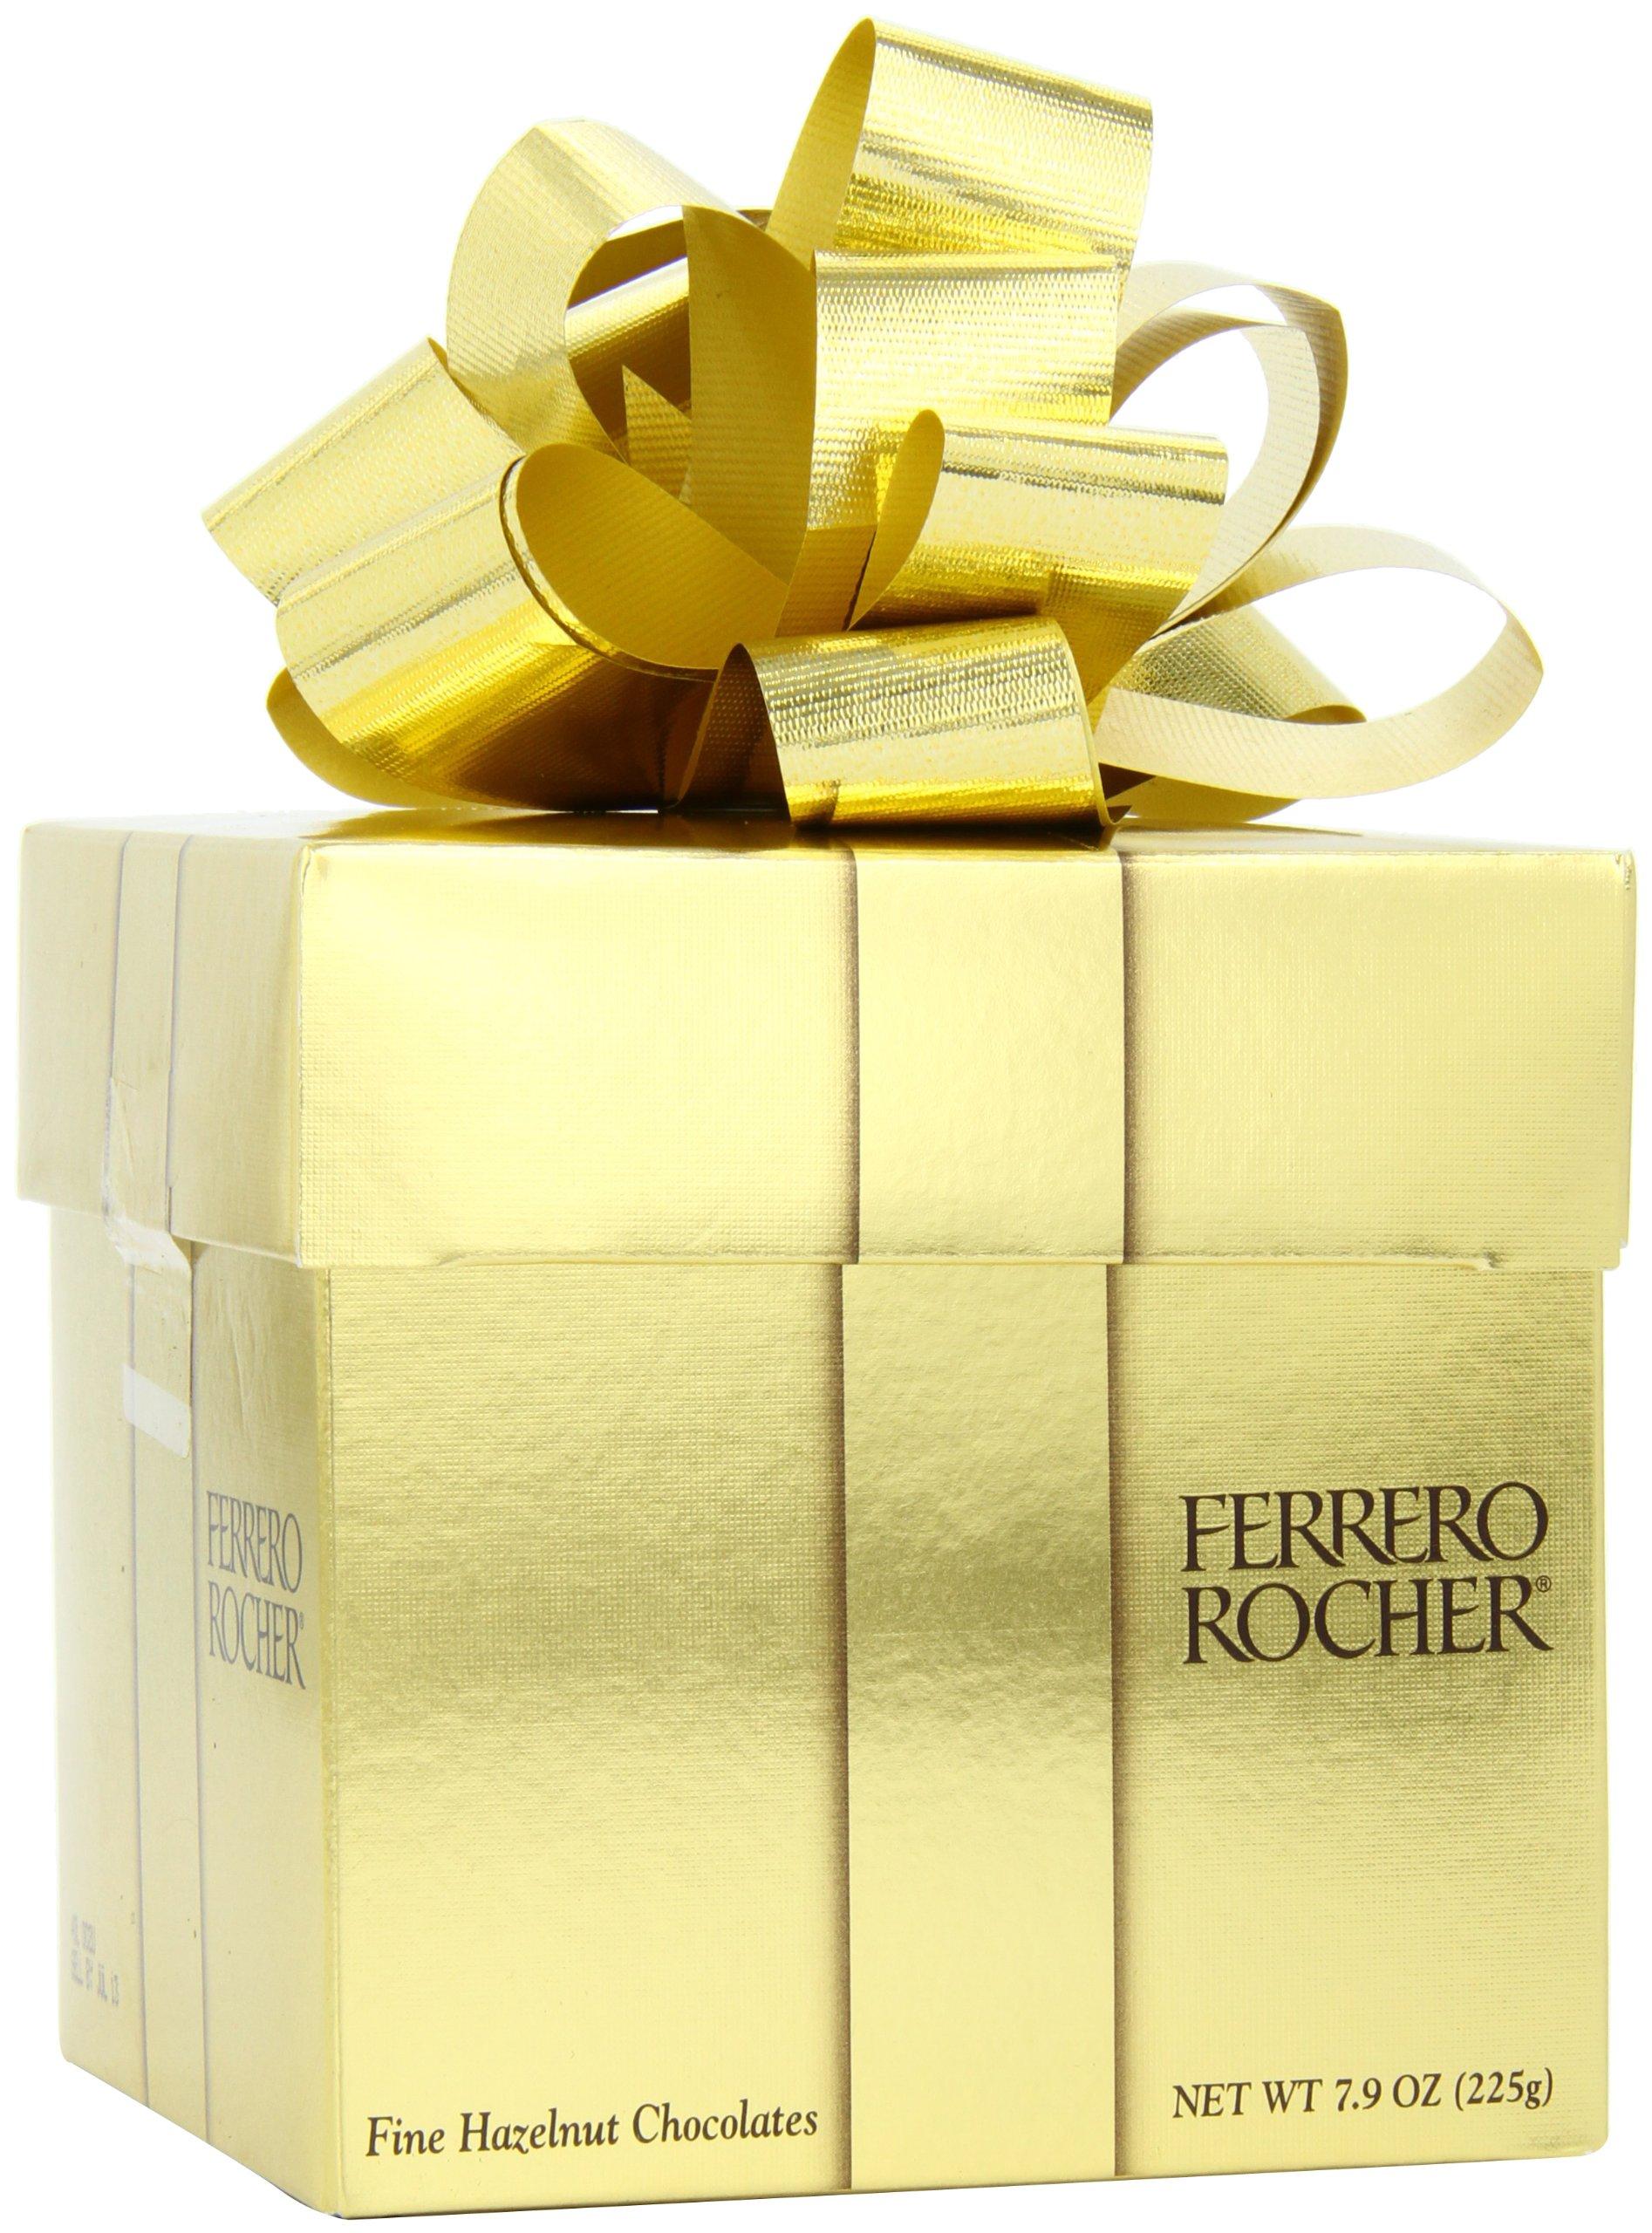 Ferrero Rocher Gift Cube ($)